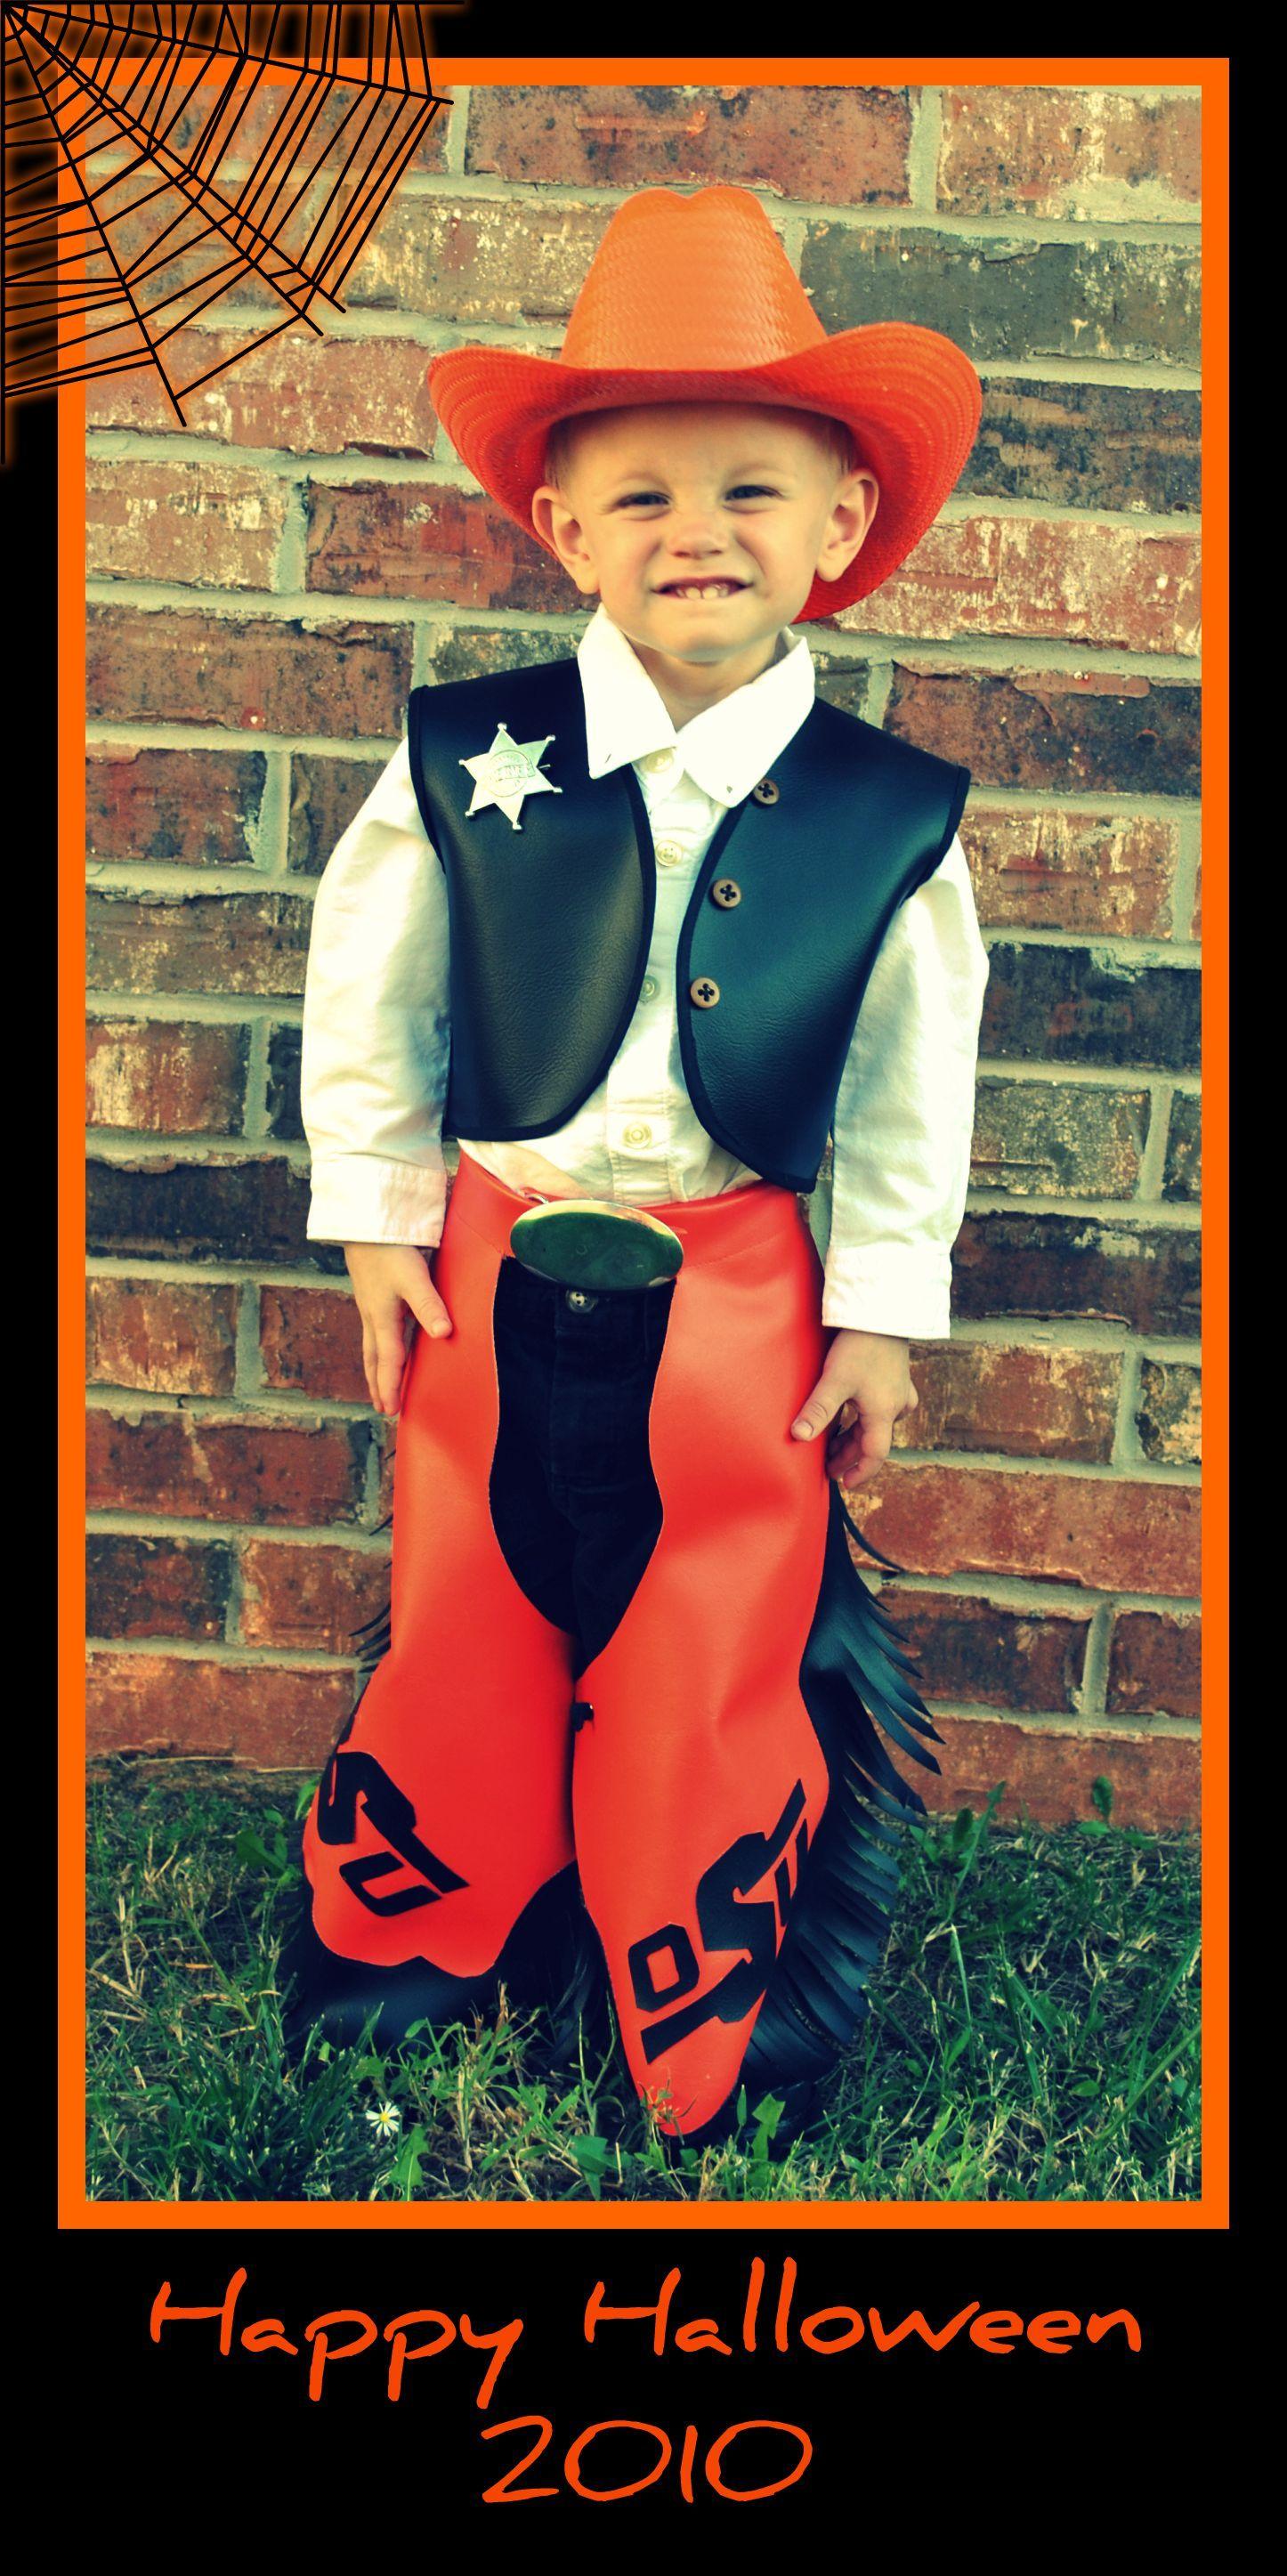 my son as pistol pete | osu | pinterest | halloween, pistol pete and